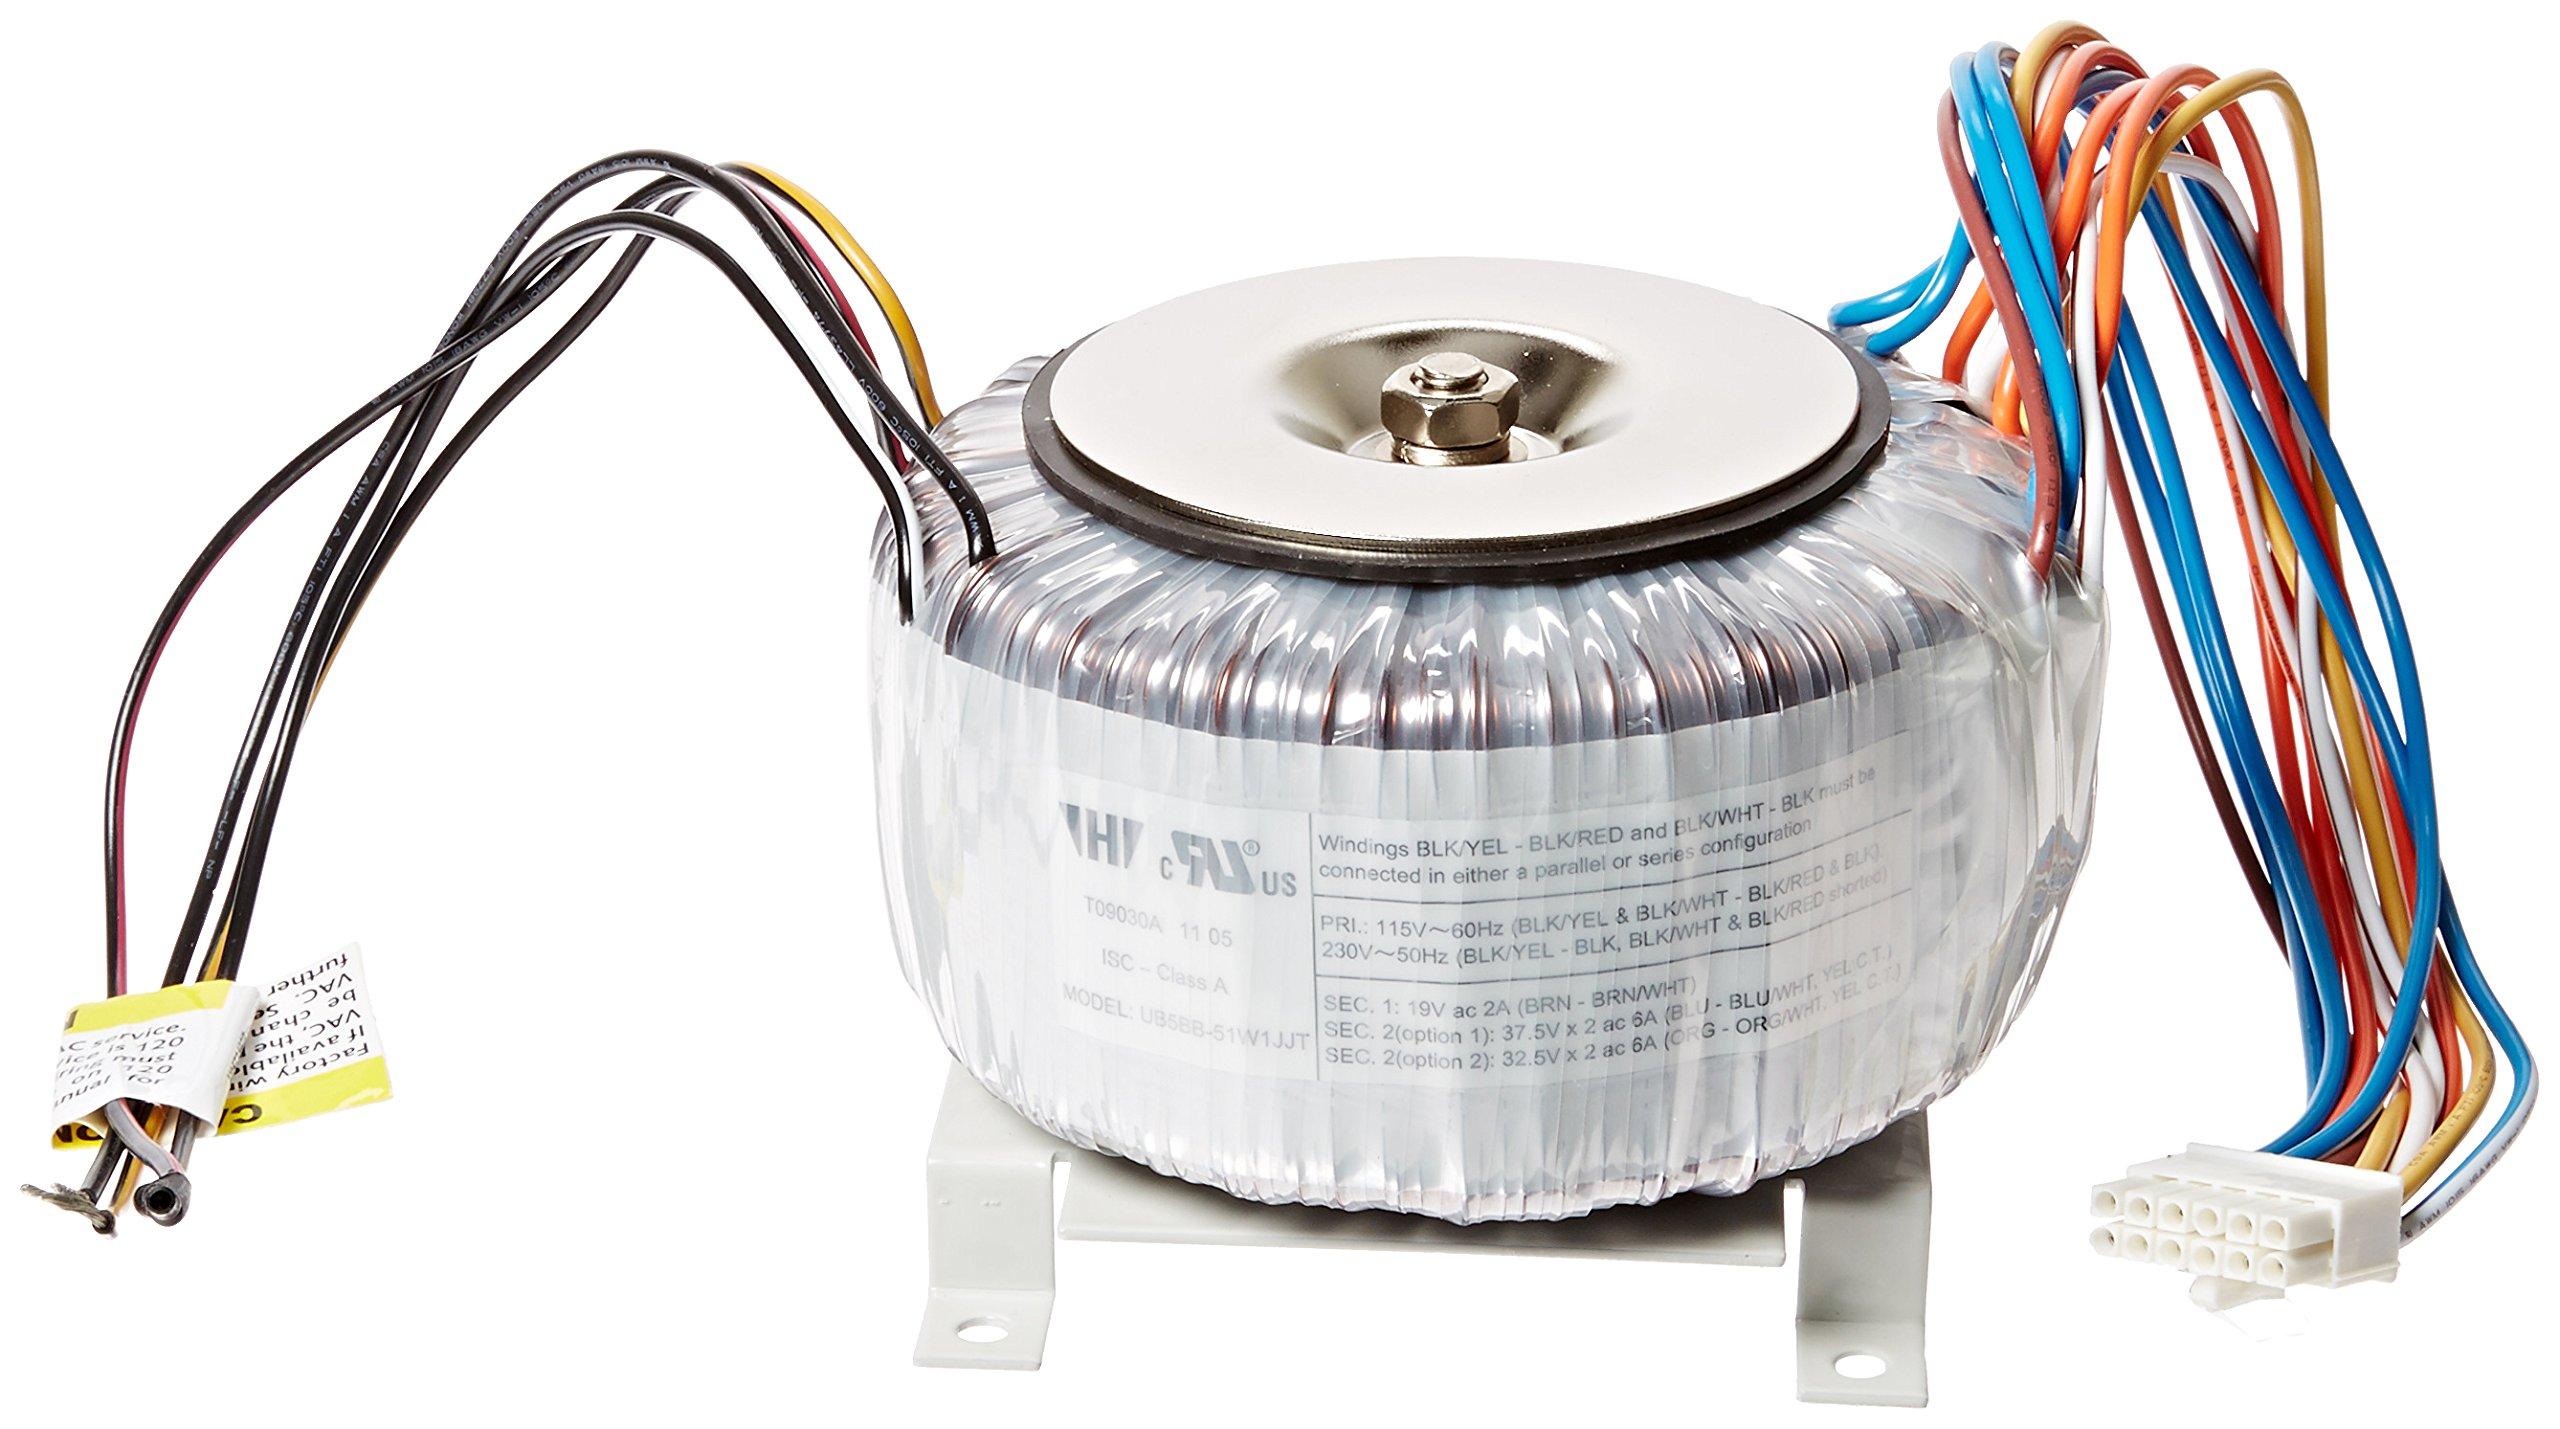 Zodiac R0481400 50/60-Hertz Transformer Replacement for Select Zodiac Jandy Water Purification System by Zodiac (Image #1)